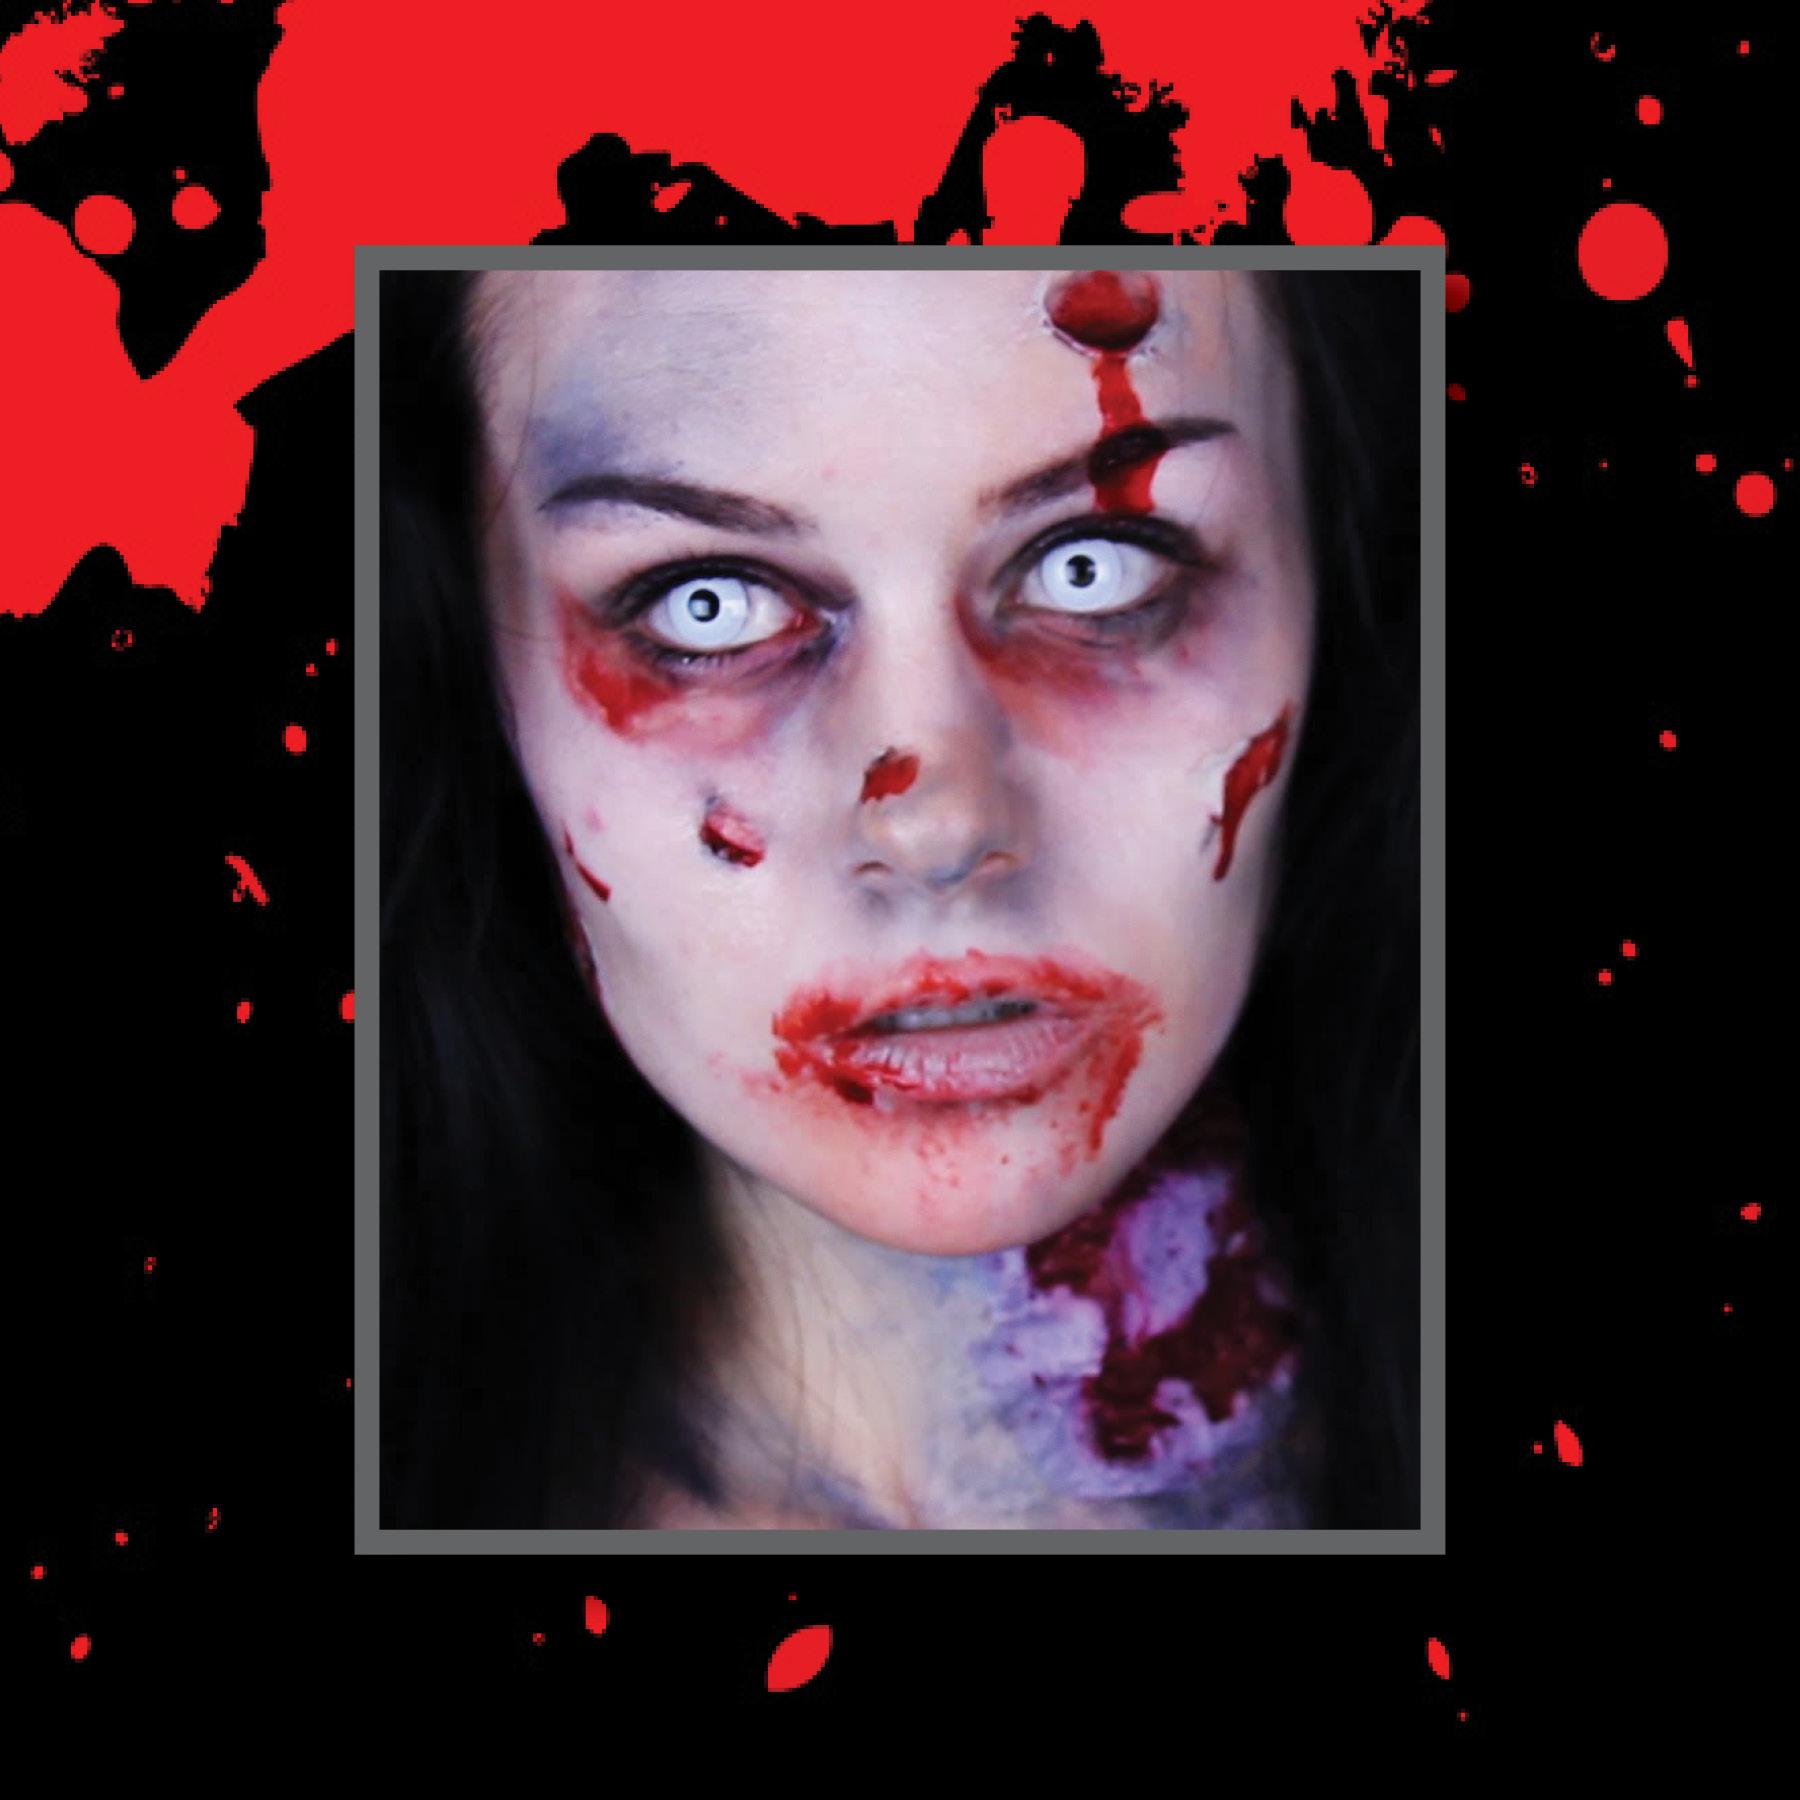 Teen Zombie Make-up Oct 13